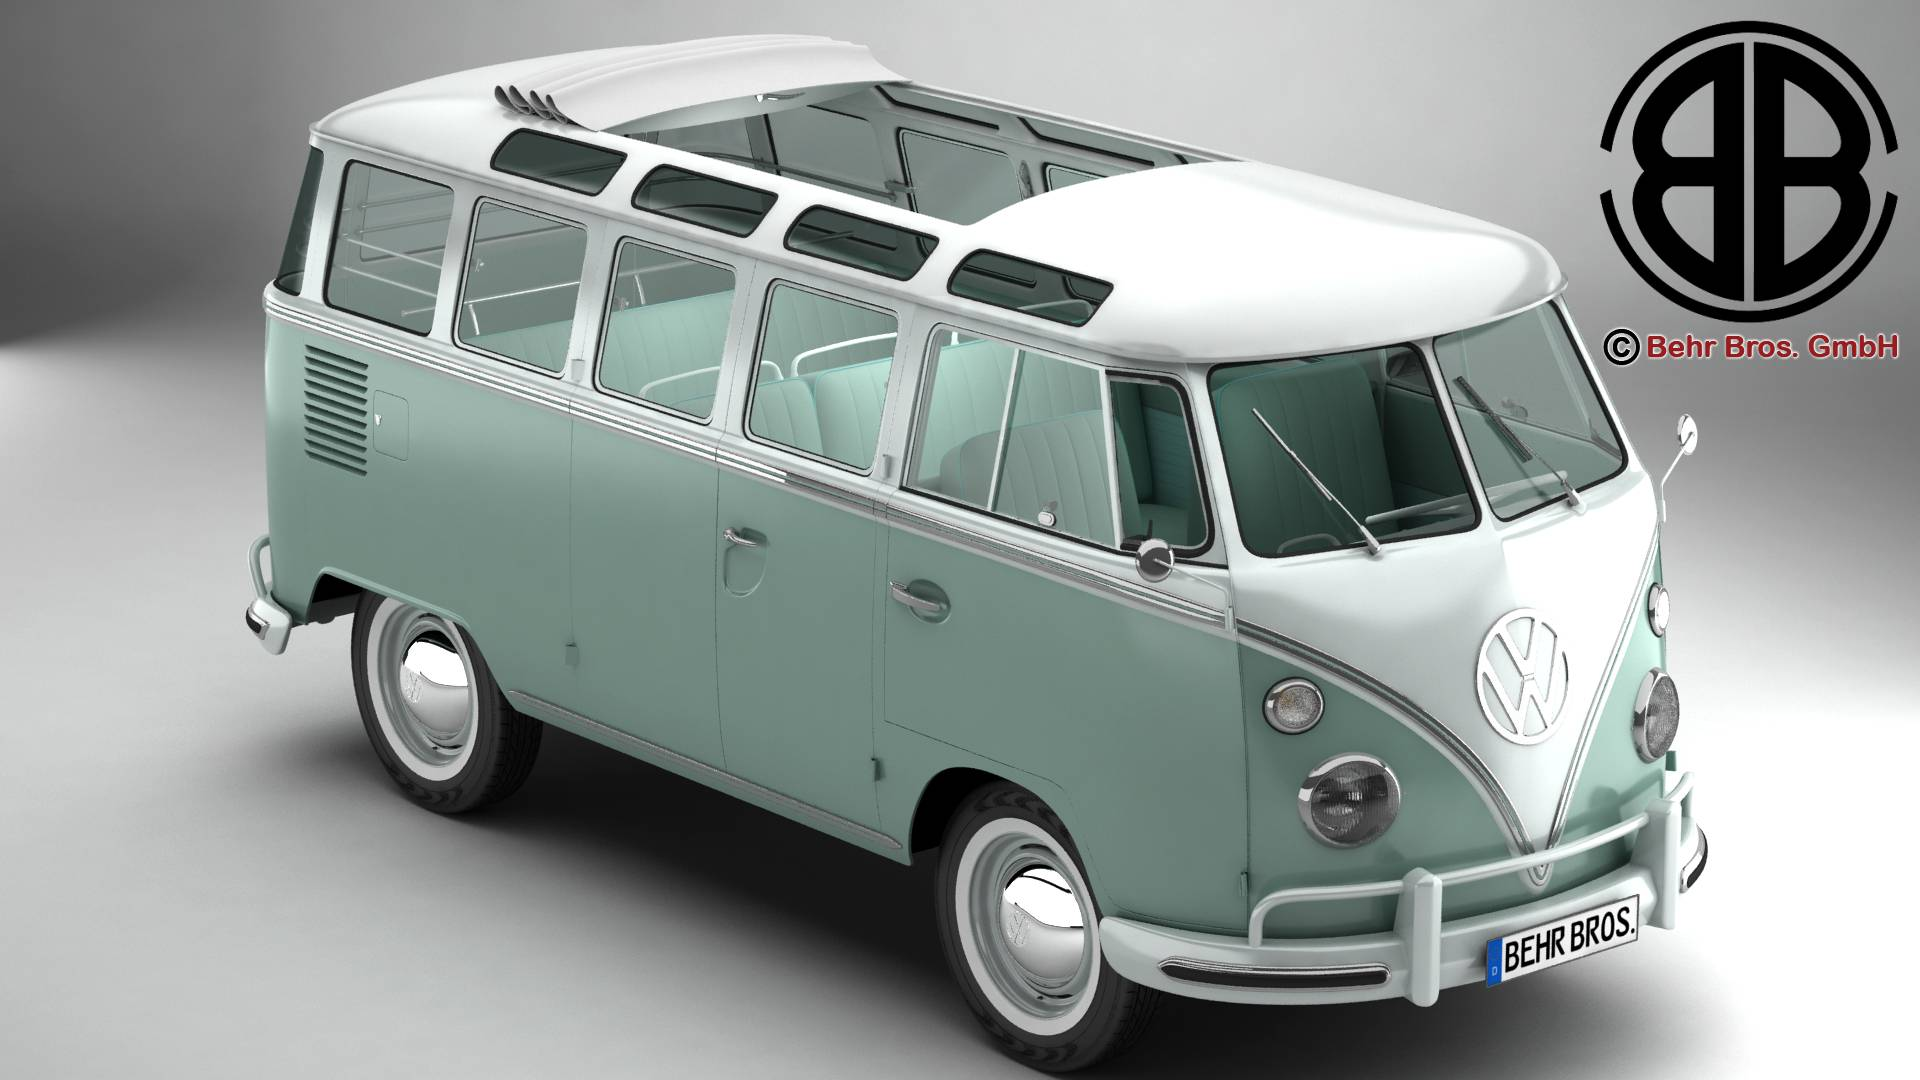 volkswagen tipas 2 samba 1963 3d modelis 3ds max fbx c4d lwo ma mb obj 217141